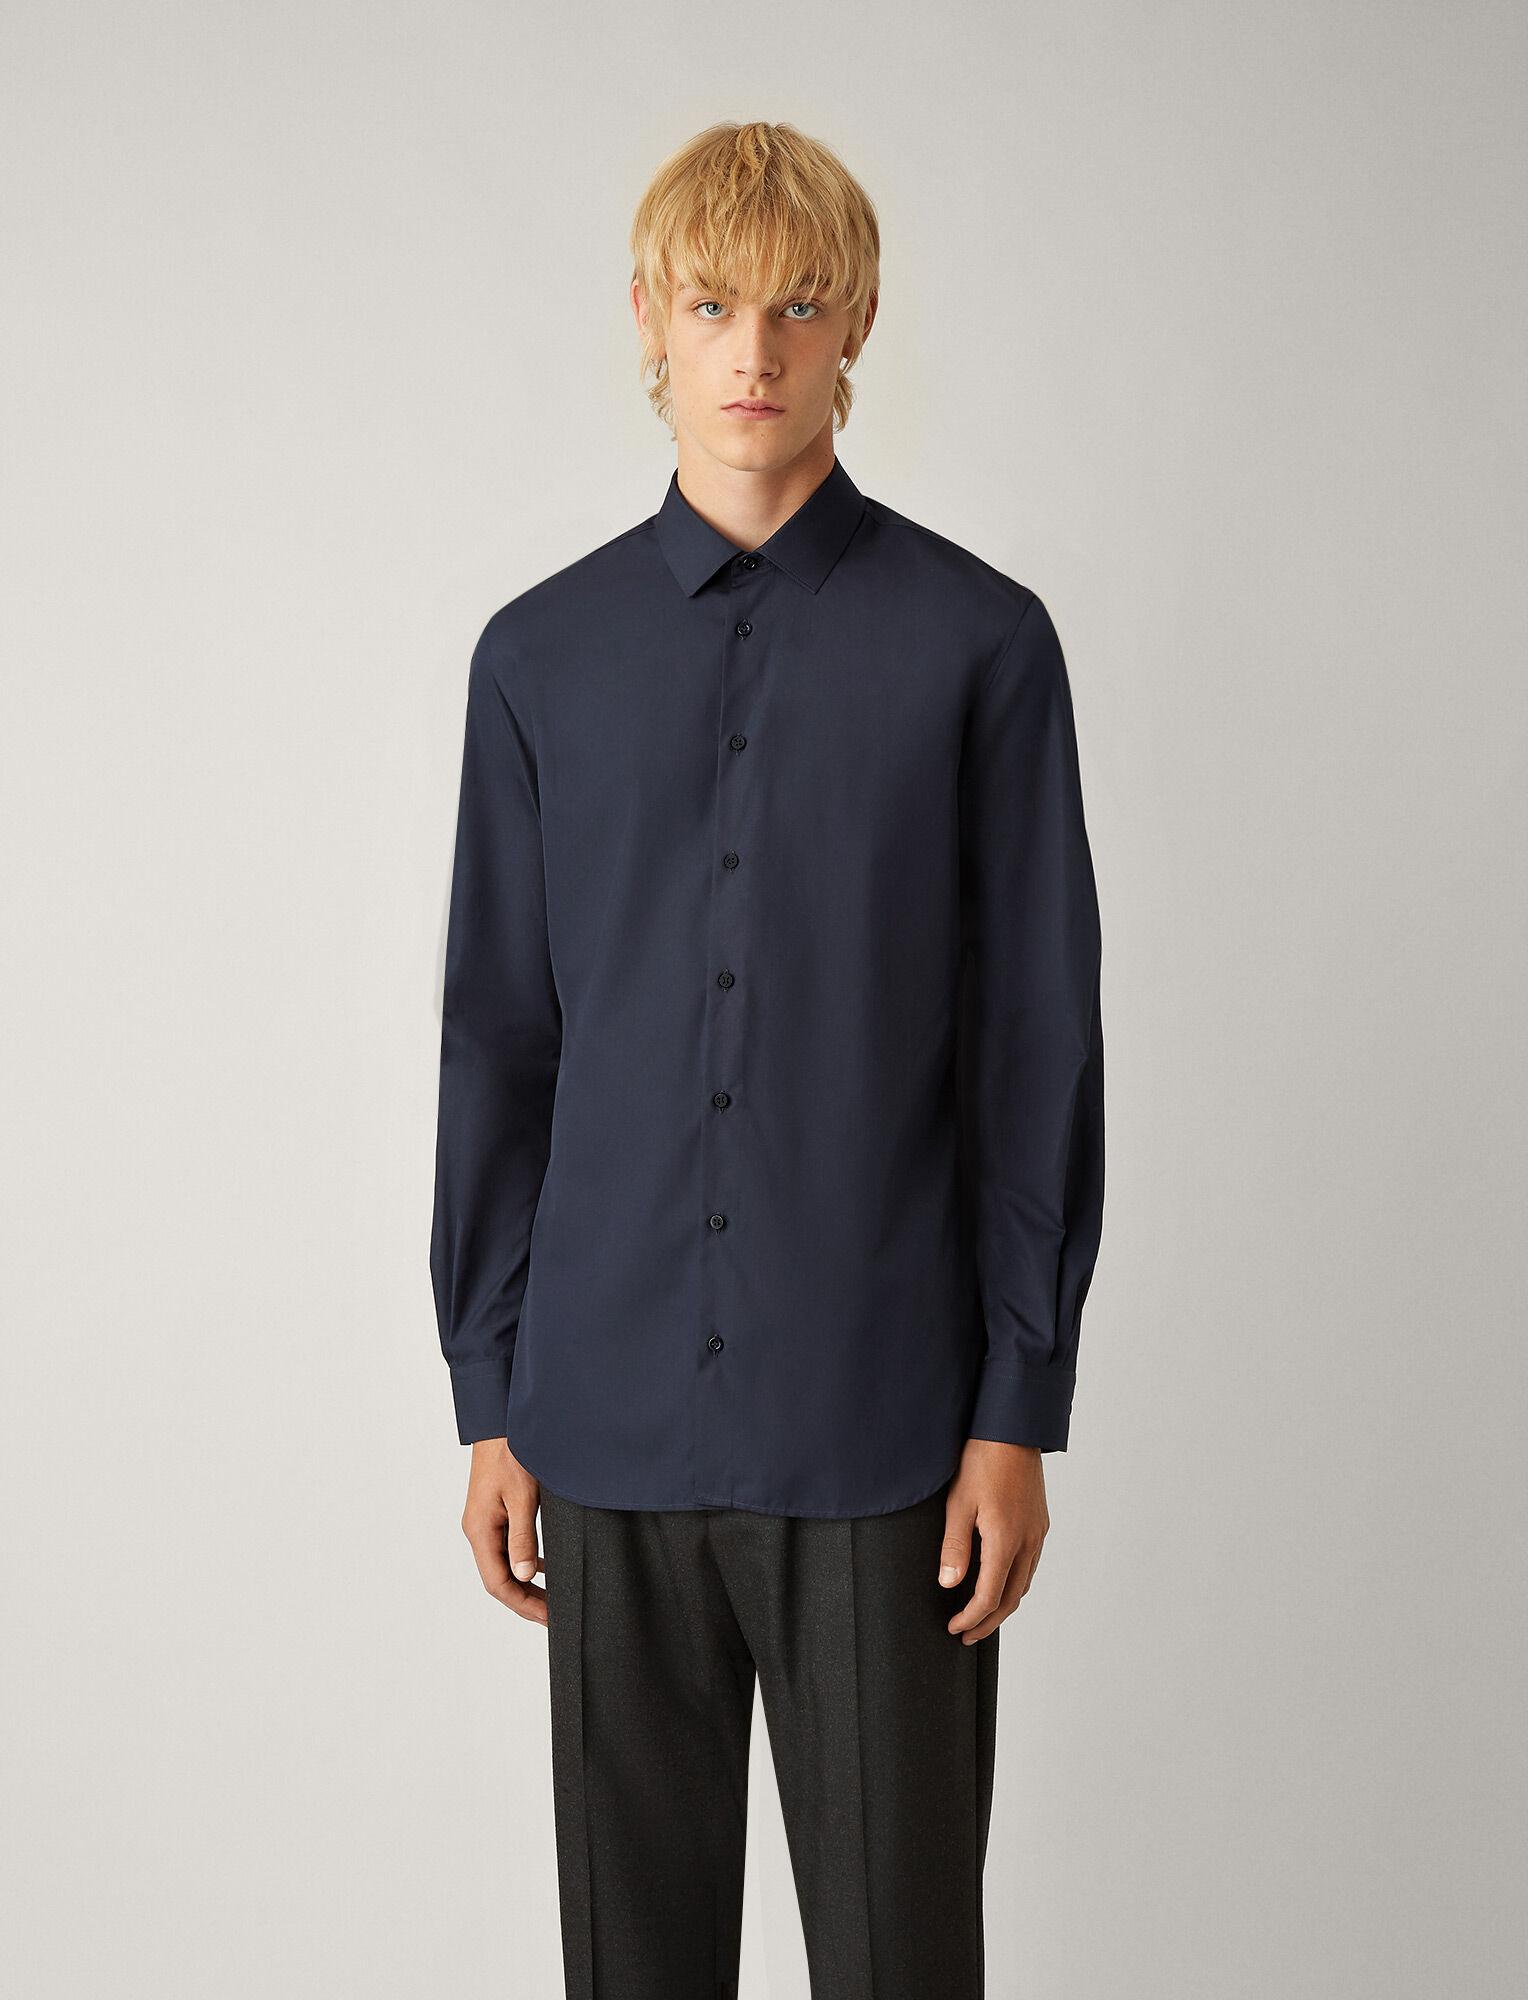 Joseph, John Poplin Shirt, in NAVY